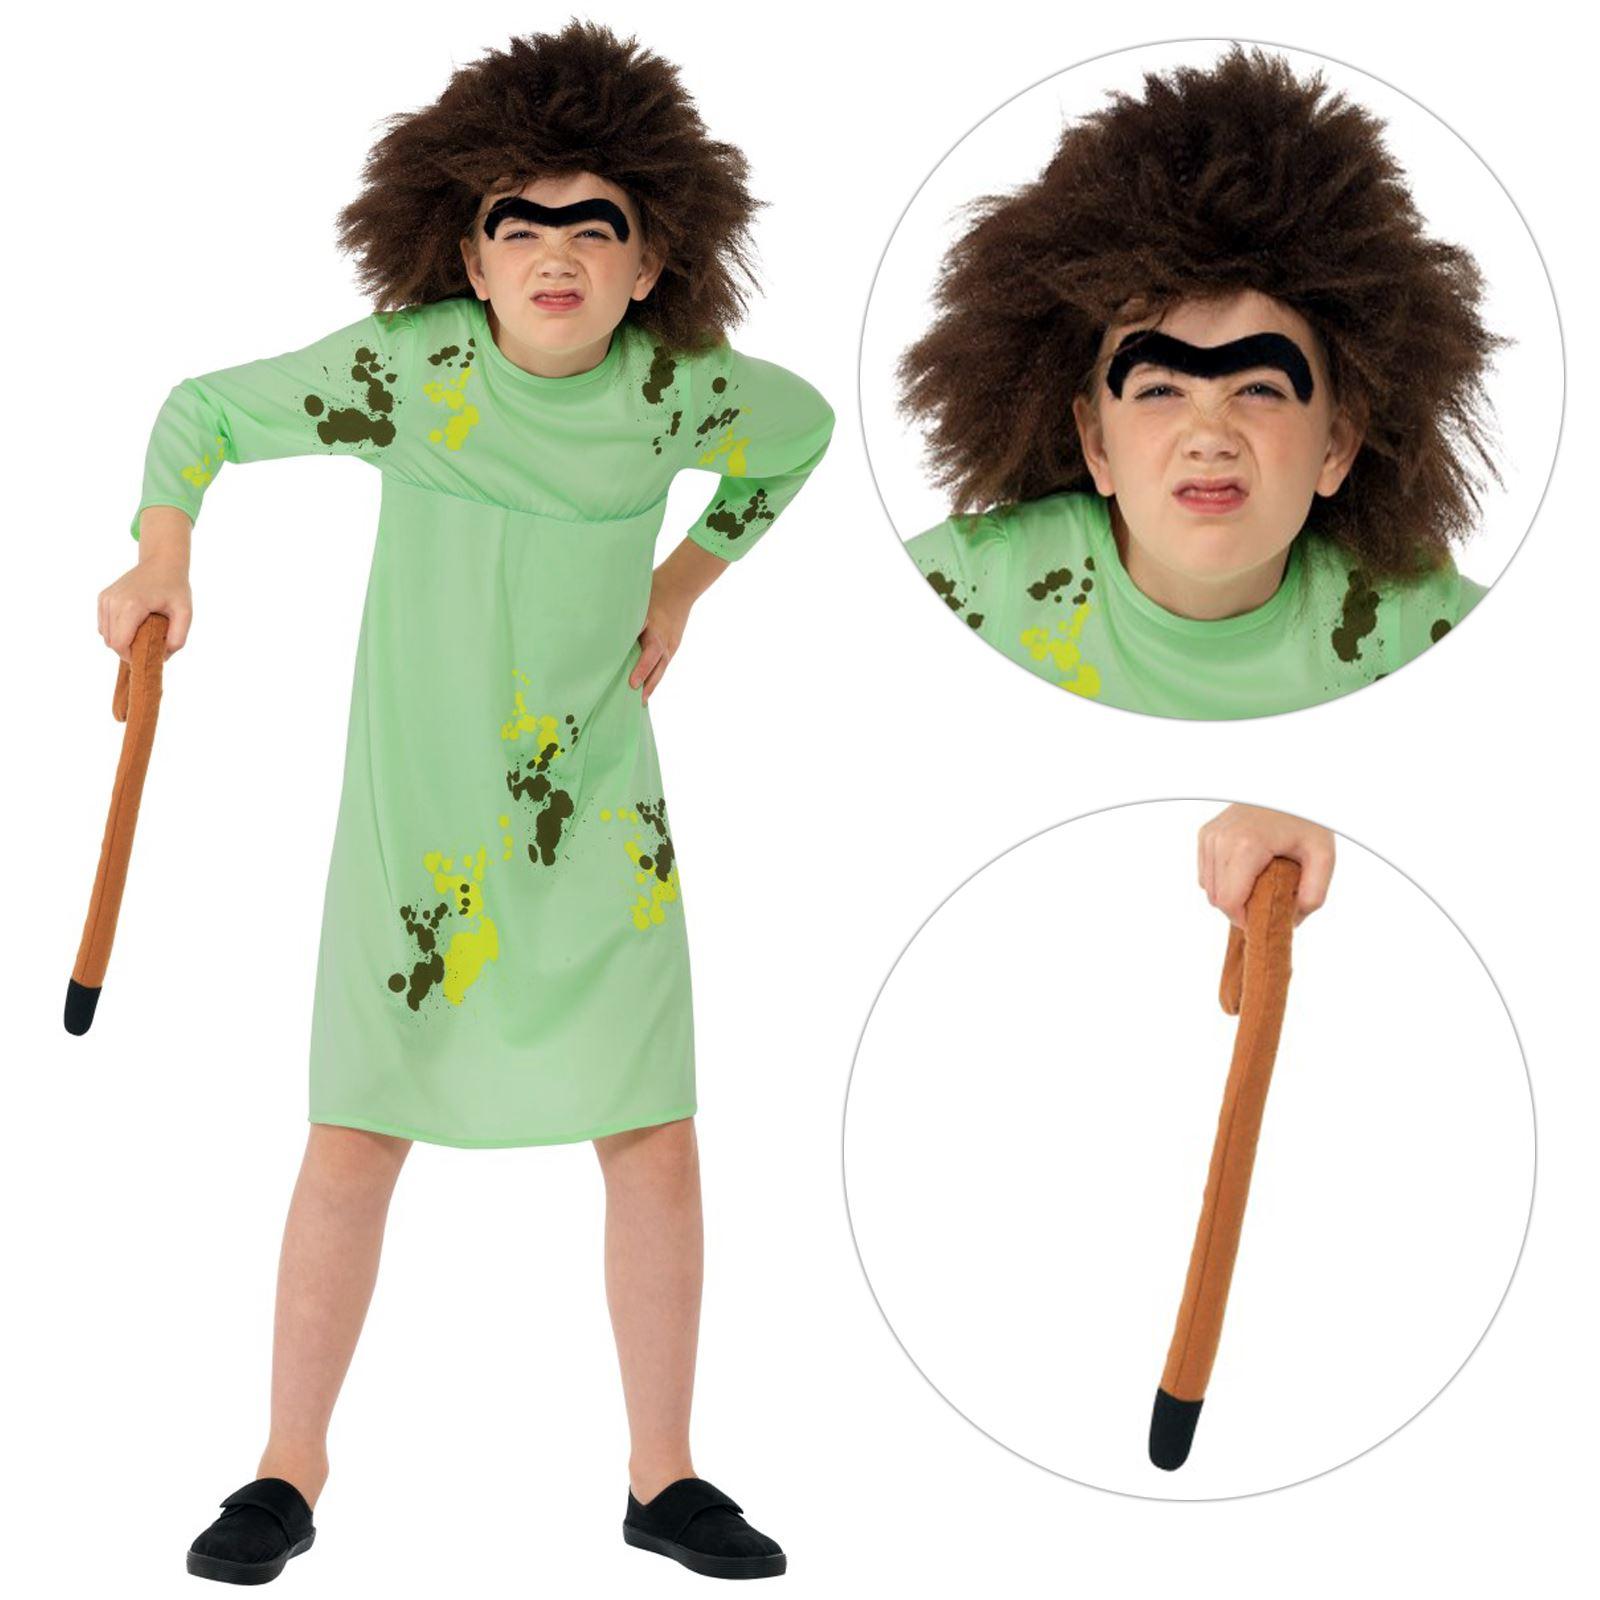 Boys Roald Dahl Mr Twit World Book Day Week Fancy Dress Costume Outfit 7-12yrs